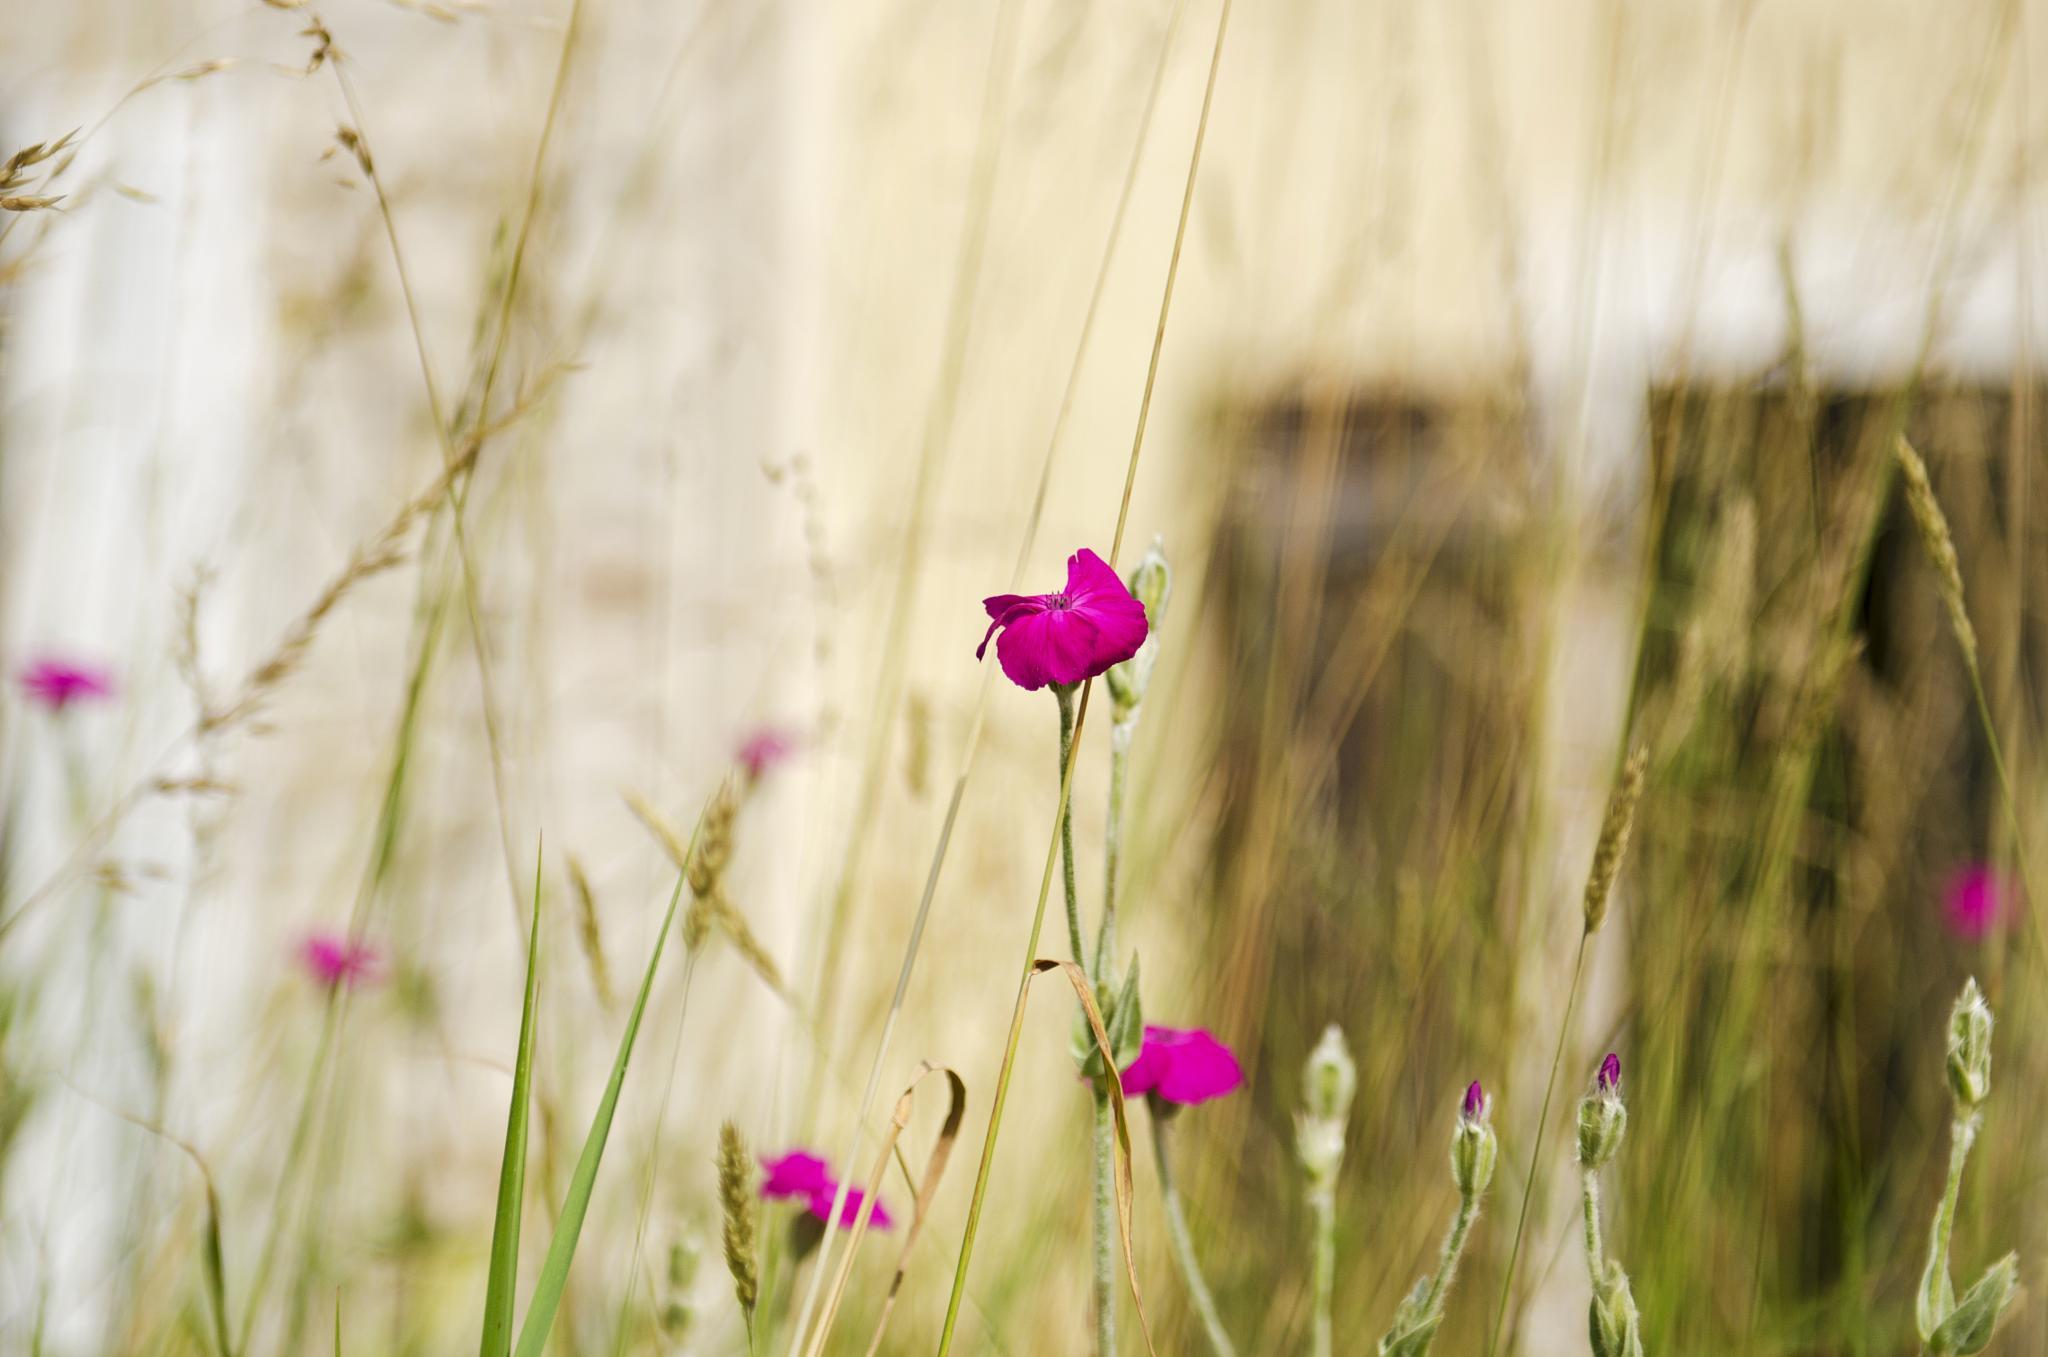 Littles flowers by Thierry Thévenet